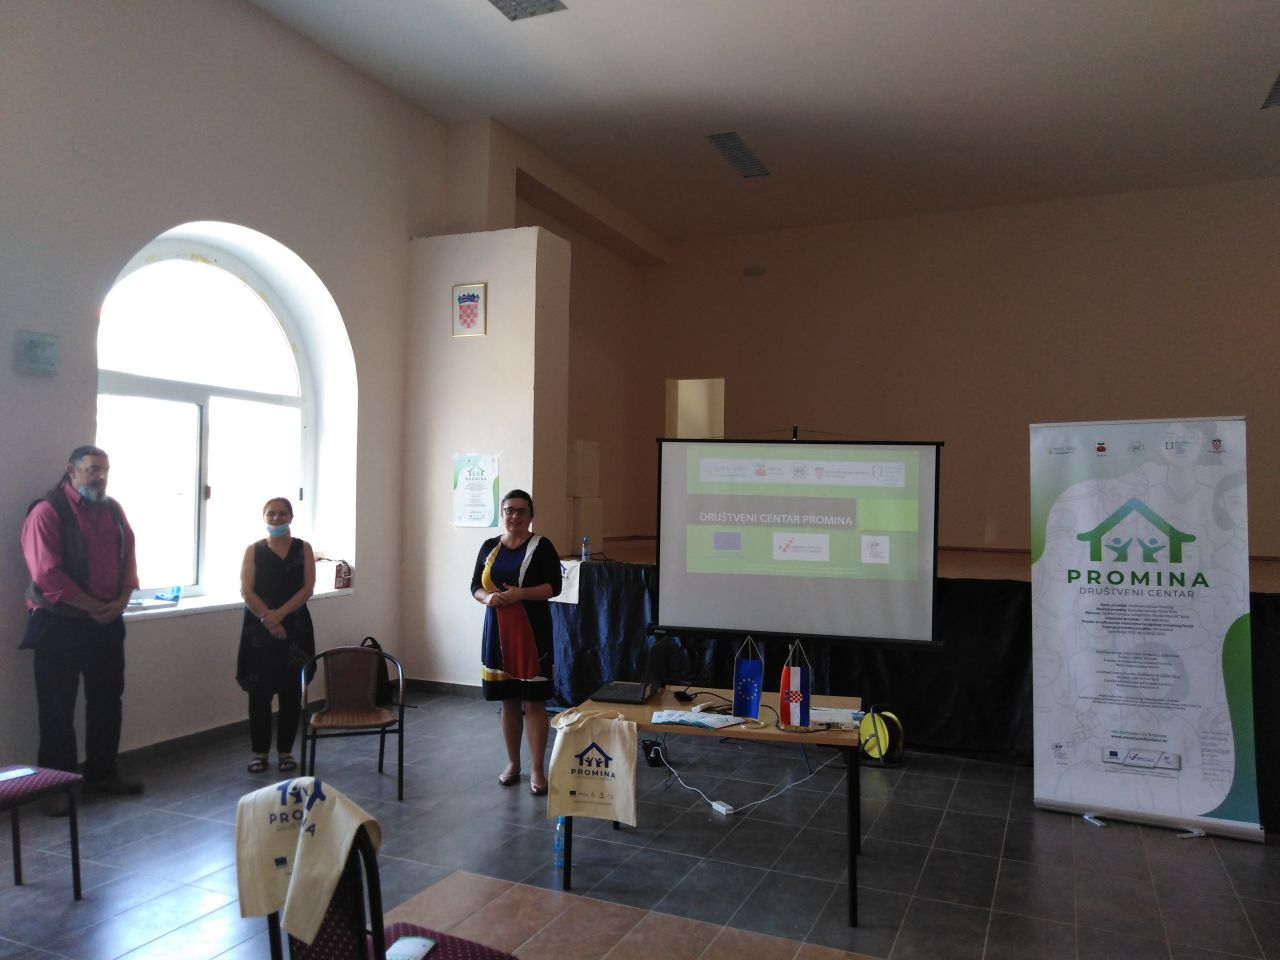 PRIOPĆENJE – Početna konferencija – projekt: Društveni centar Promina